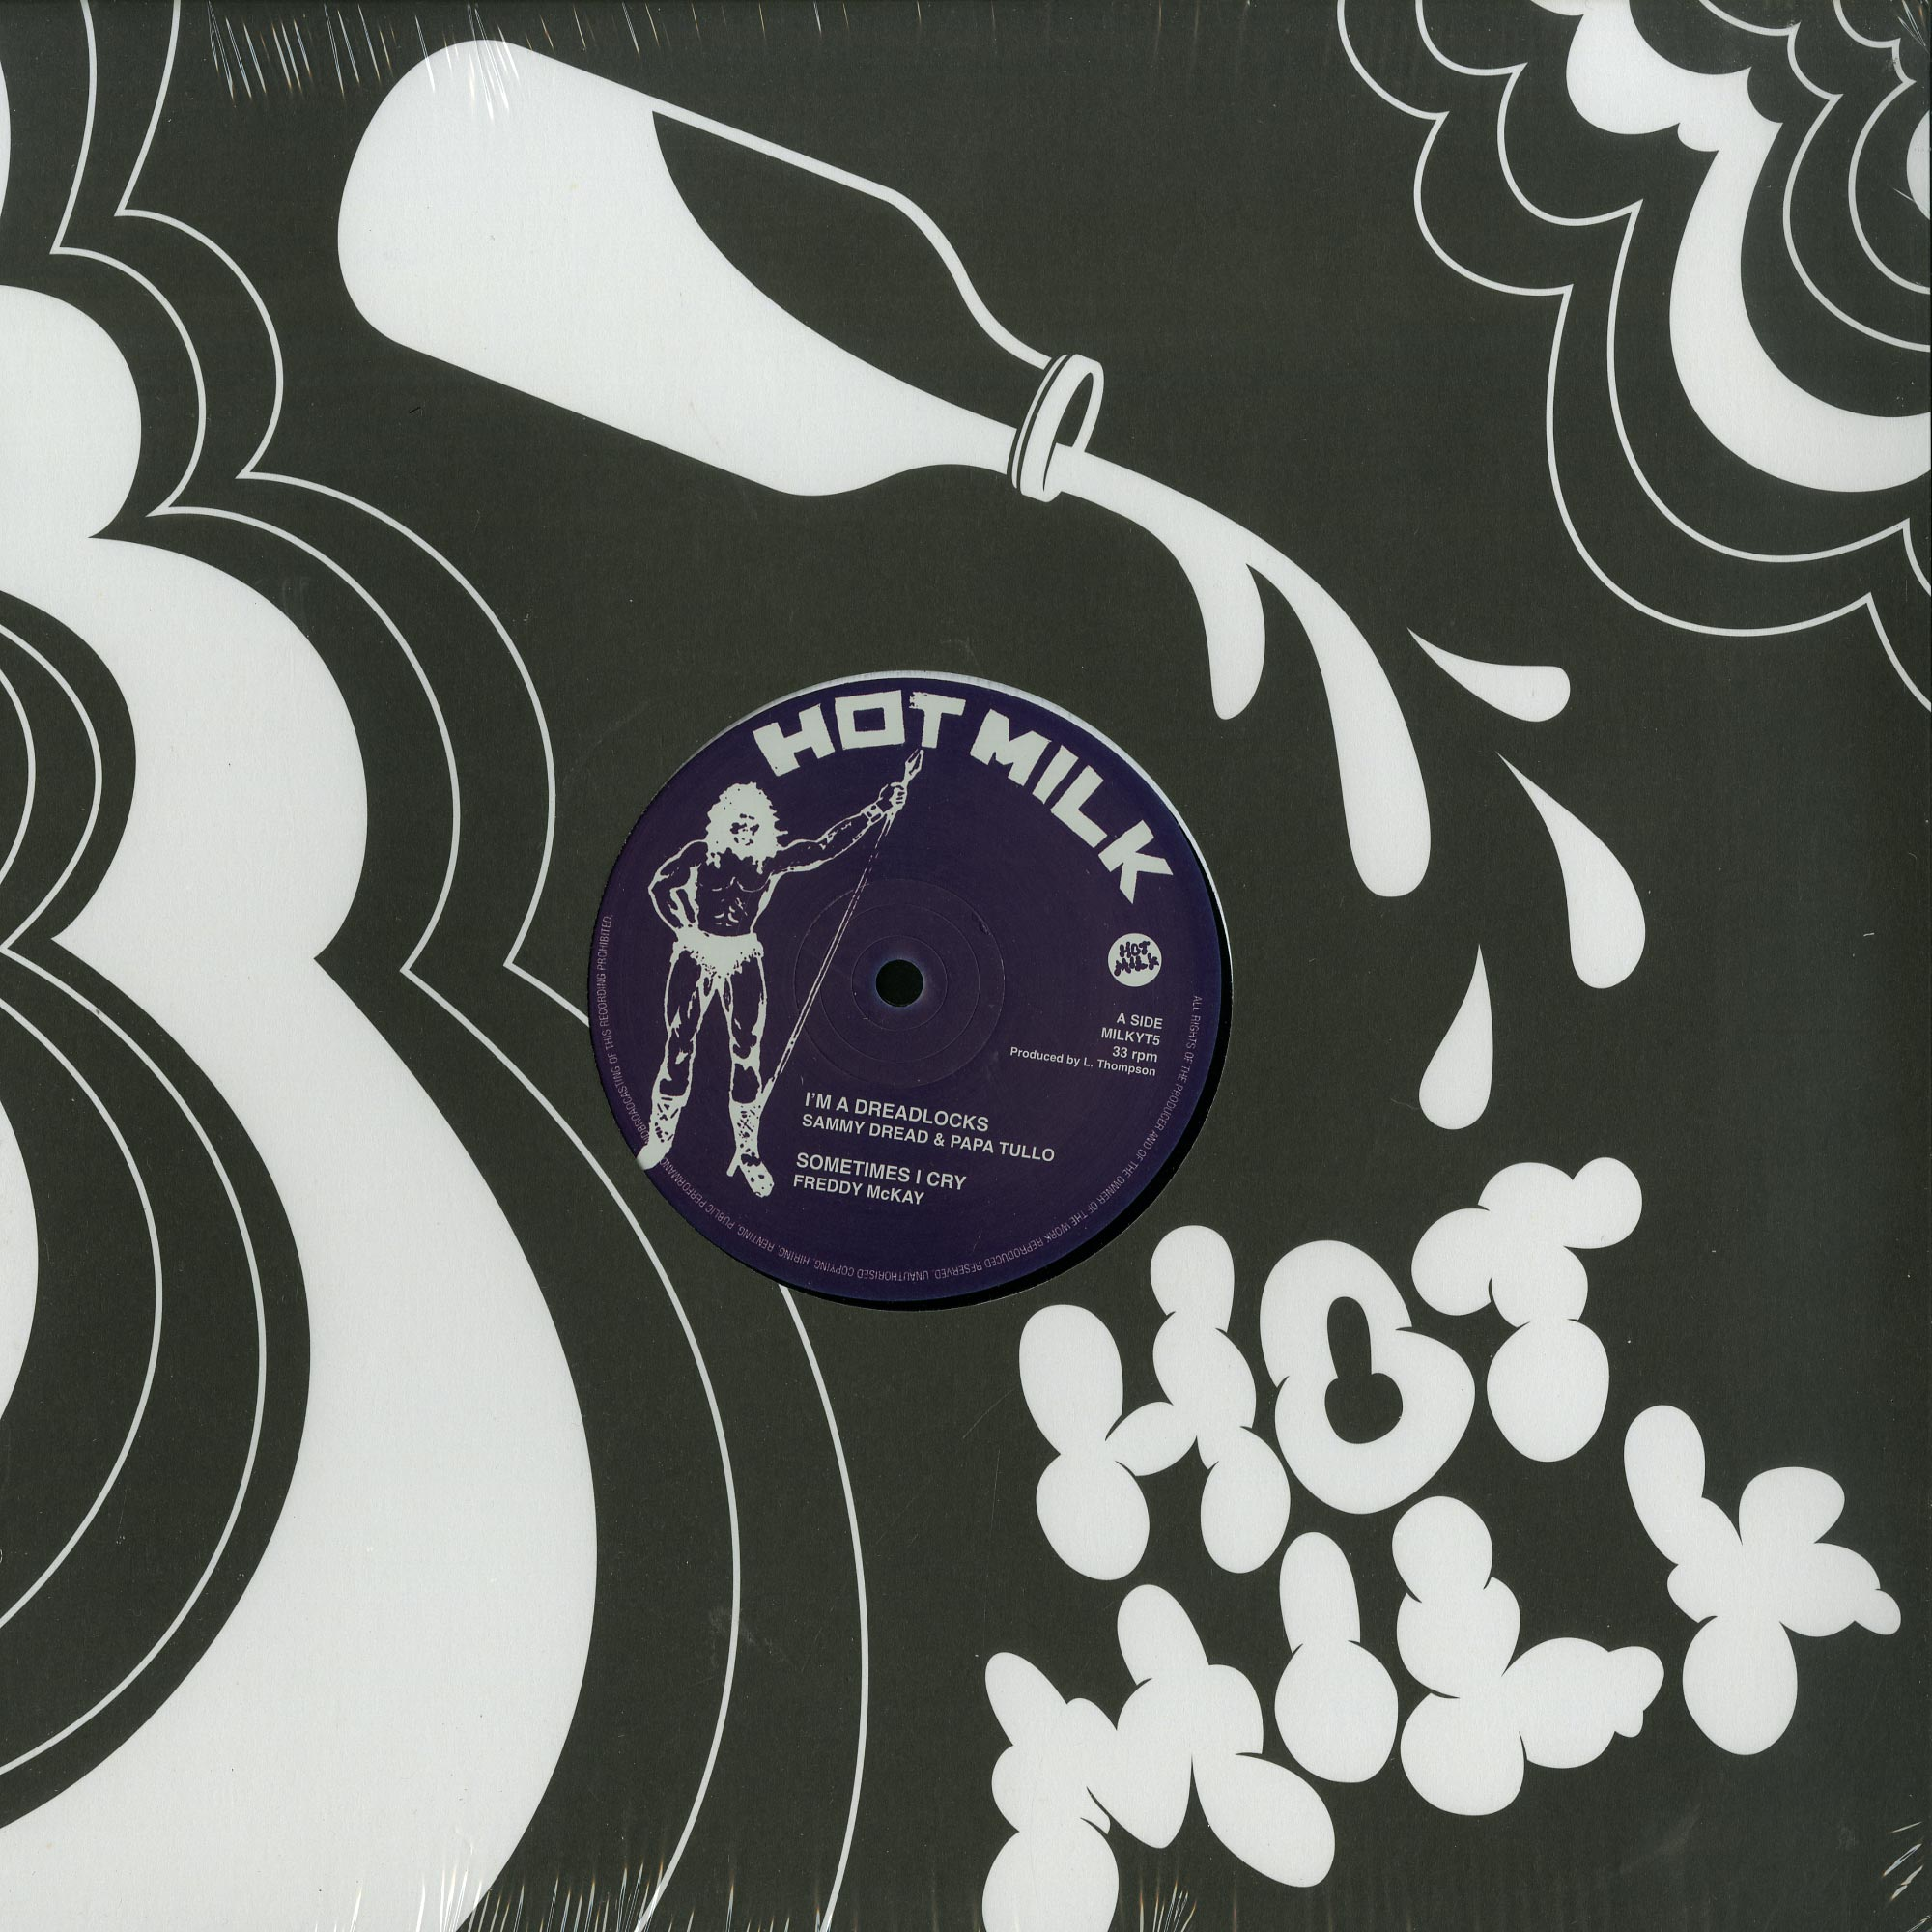 Sammy Dread / Papa Tullo / Freddy McKay - I M A DREAD LOCKS - STRONG LIKE SAMPSON EP5